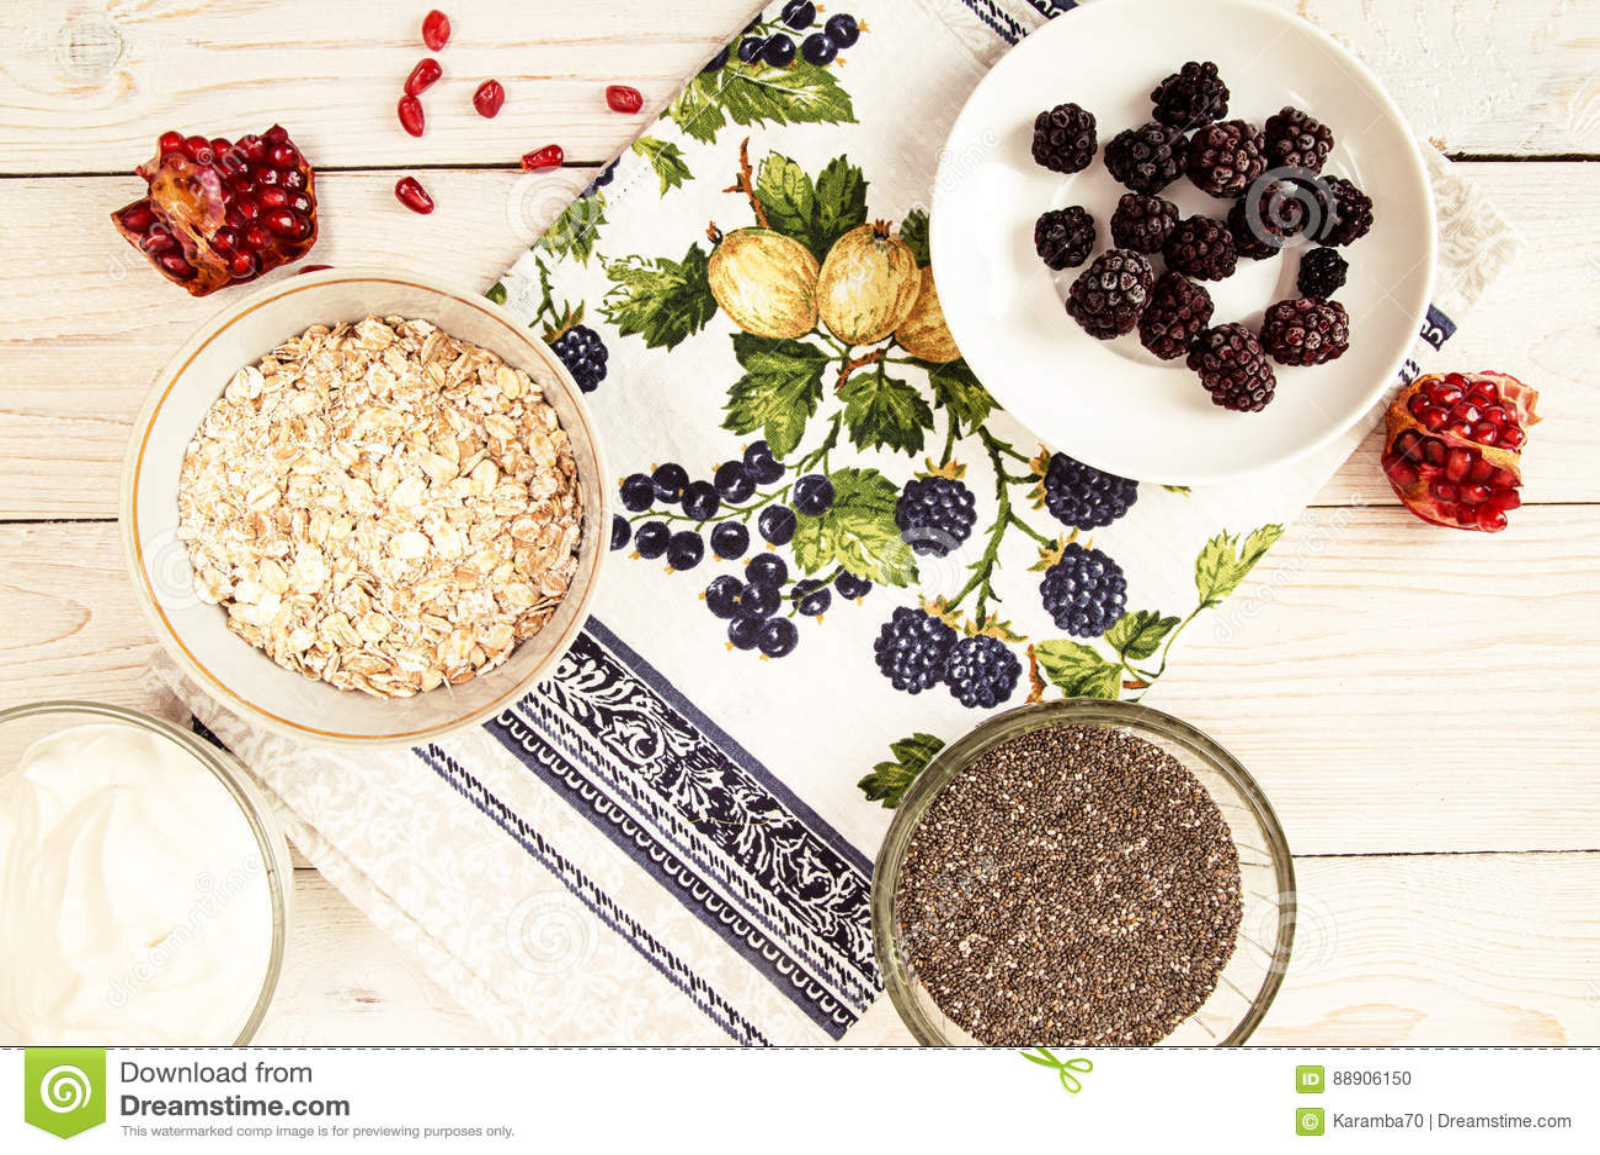 Ingredient for preparing healthy breakfast: chia, muesli, frozen